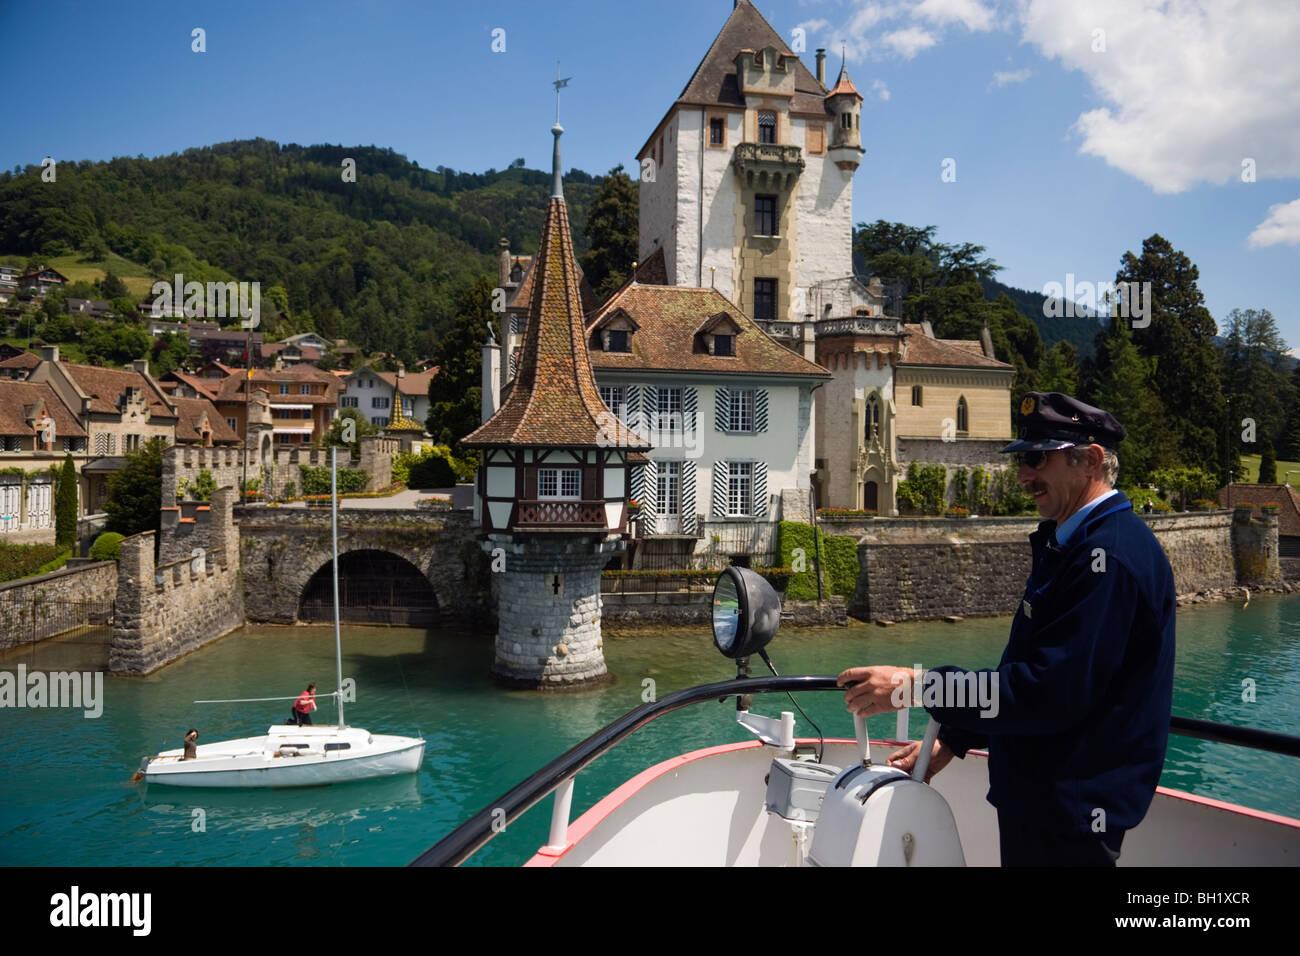 Captain during a docking manoeuvre, Sailing boat passing Castle Oberhofen, Lake Thun, Oberhofen, Bernese Oberland - Stock Image